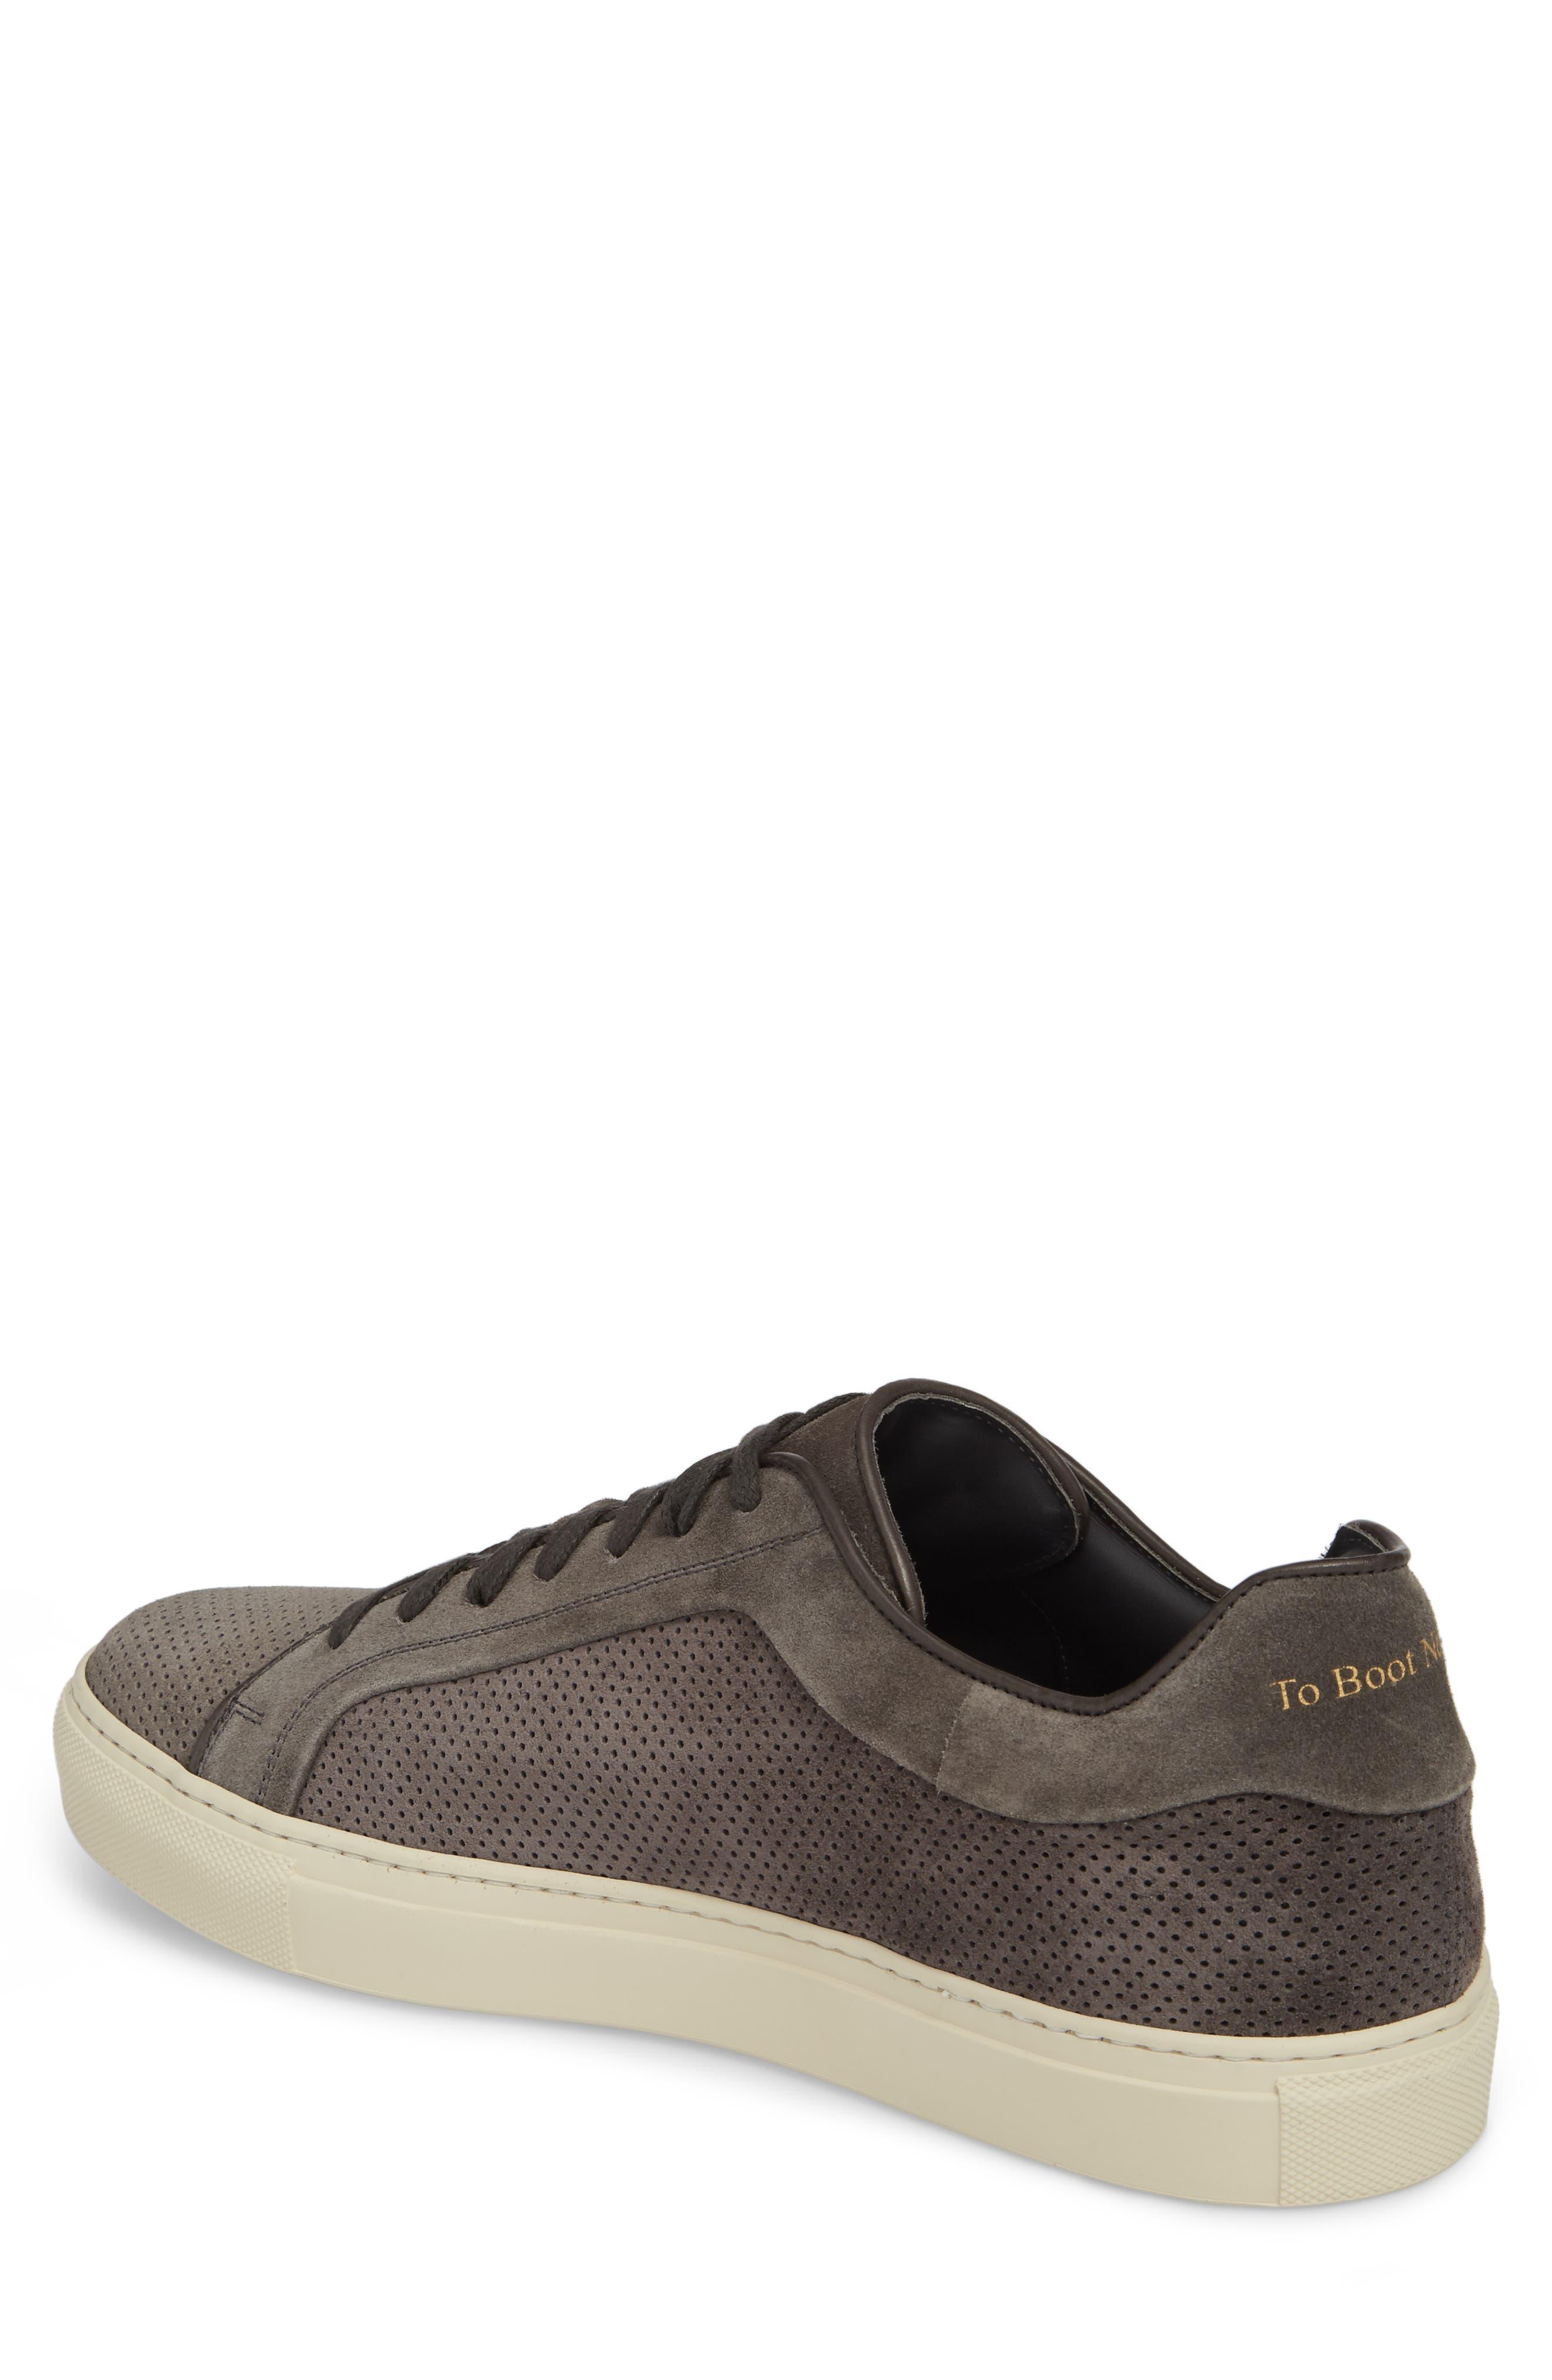 Hendrick Perforated Sneaker,                             Alternate thumbnail 2, color,                             Lavagna